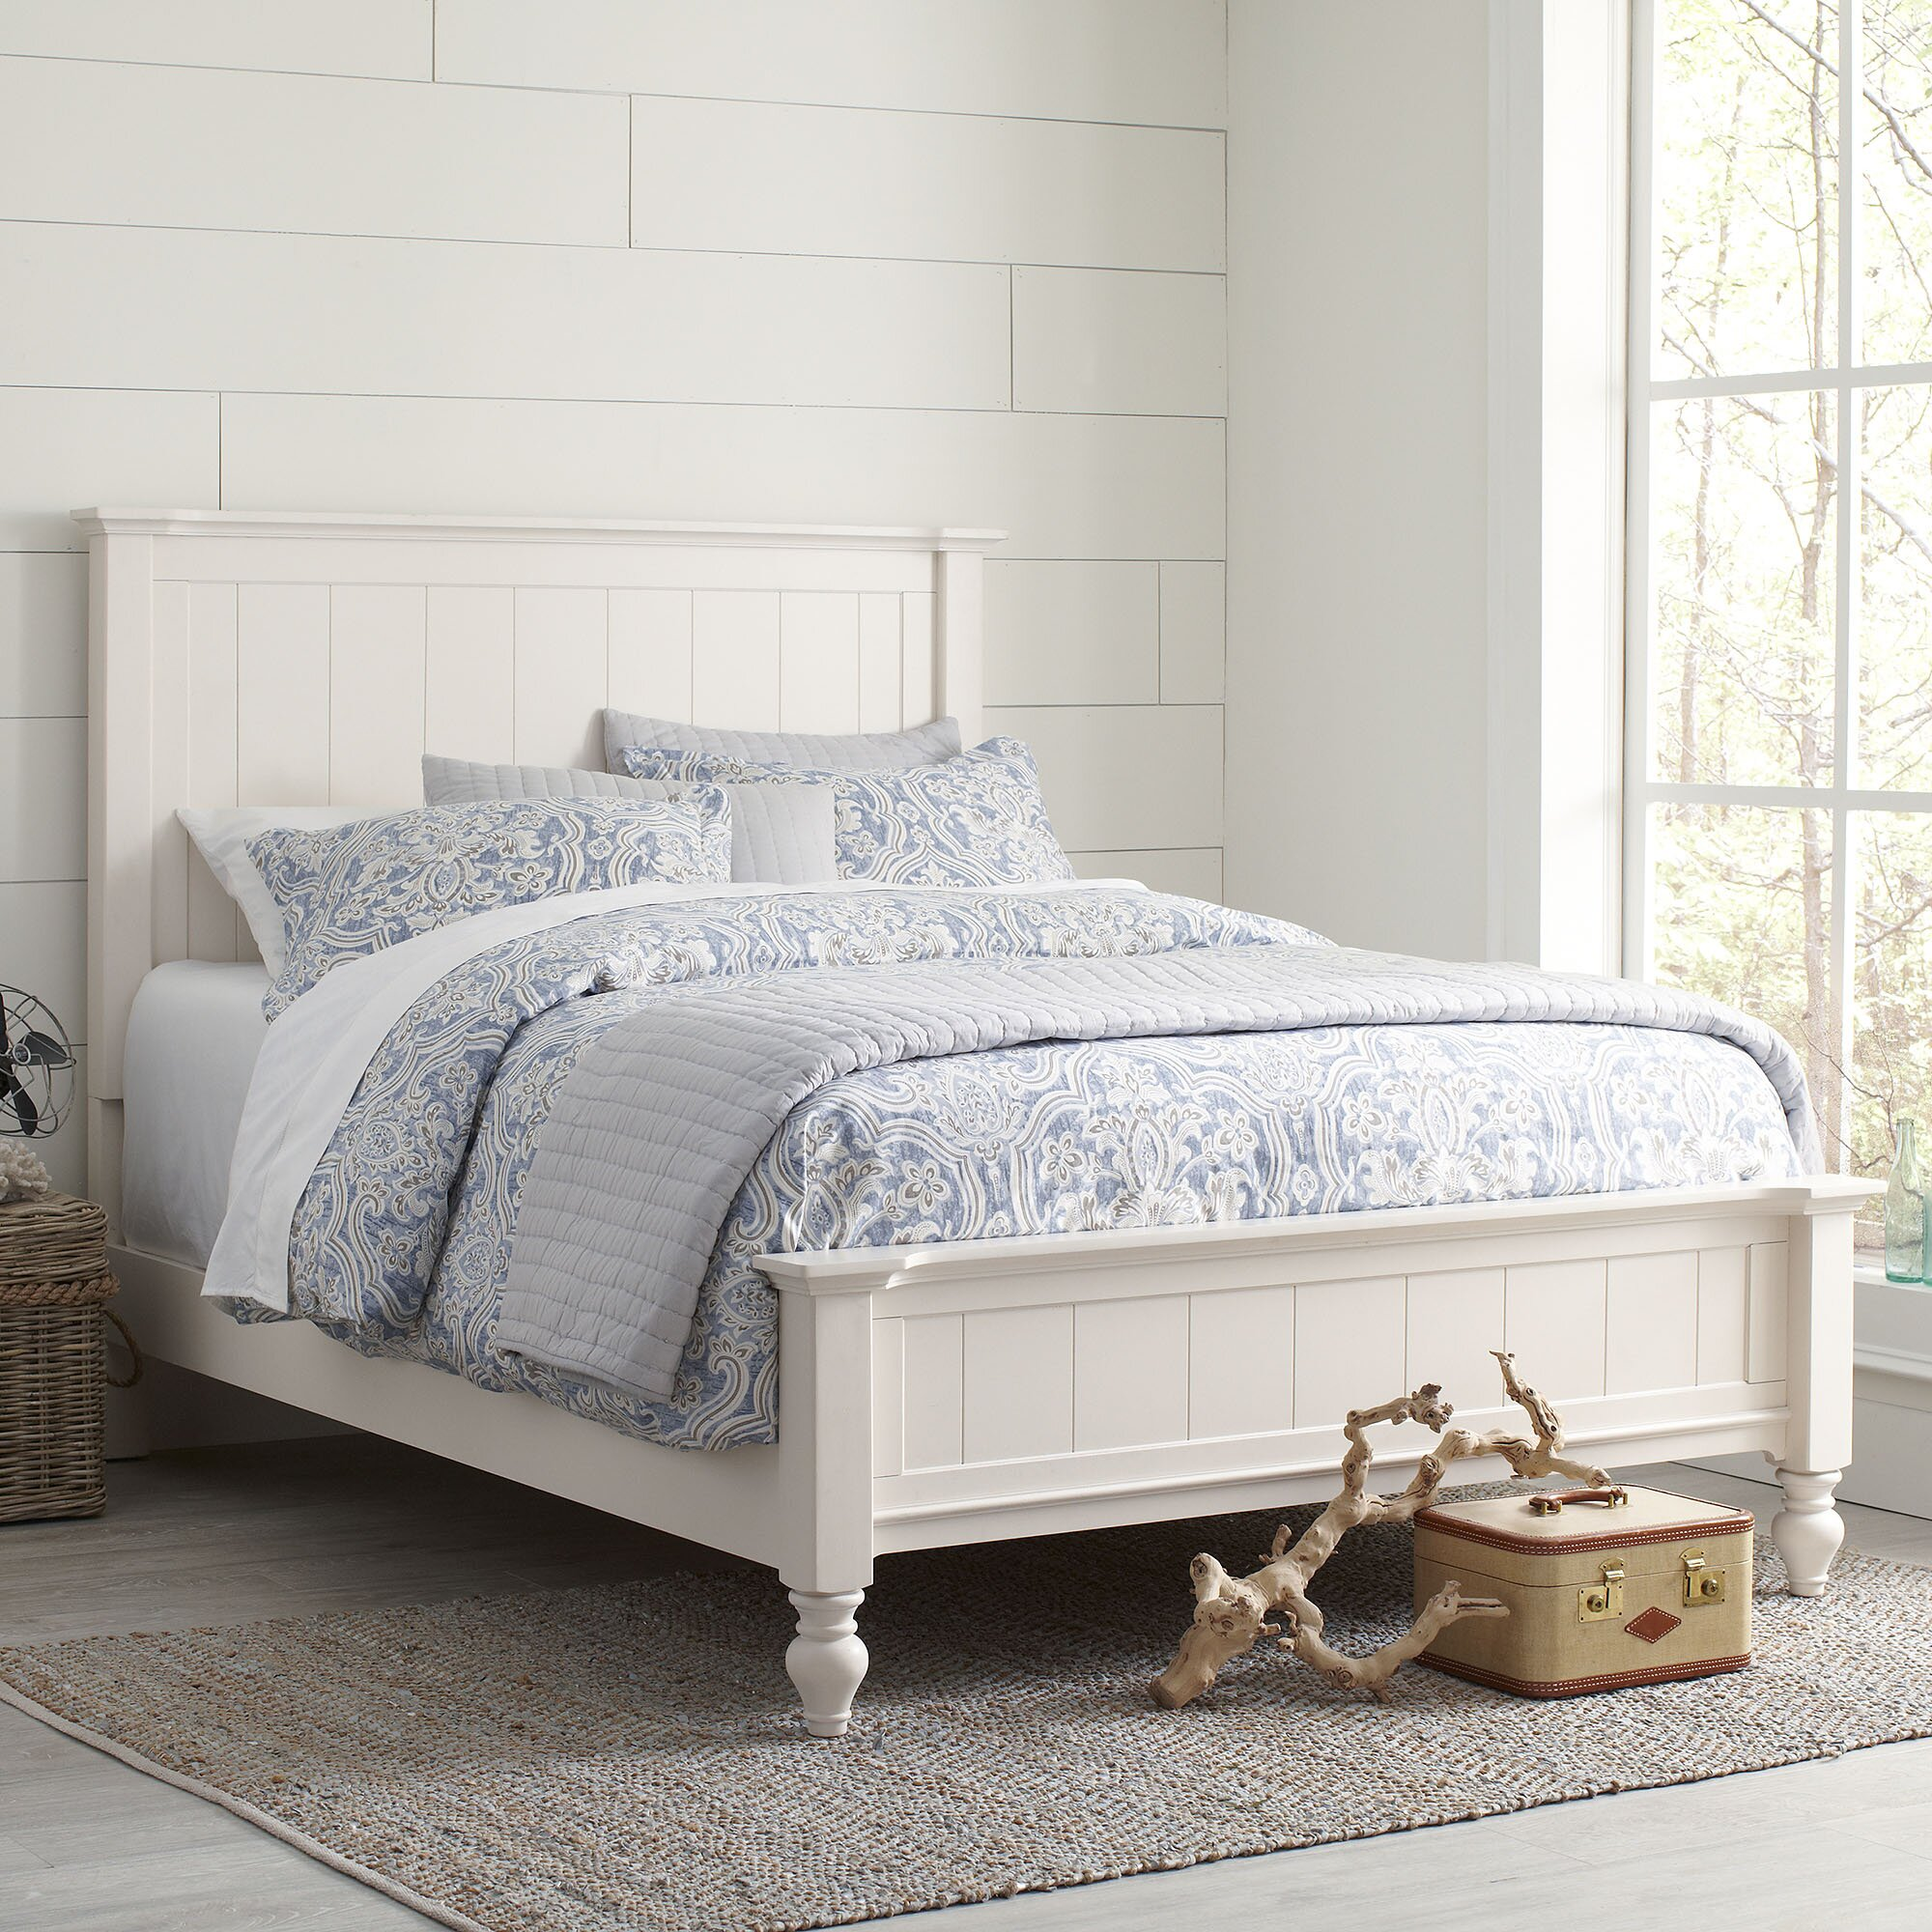 Birch lane caleb panel bed reviews wayfair for Lane bedroom furniture